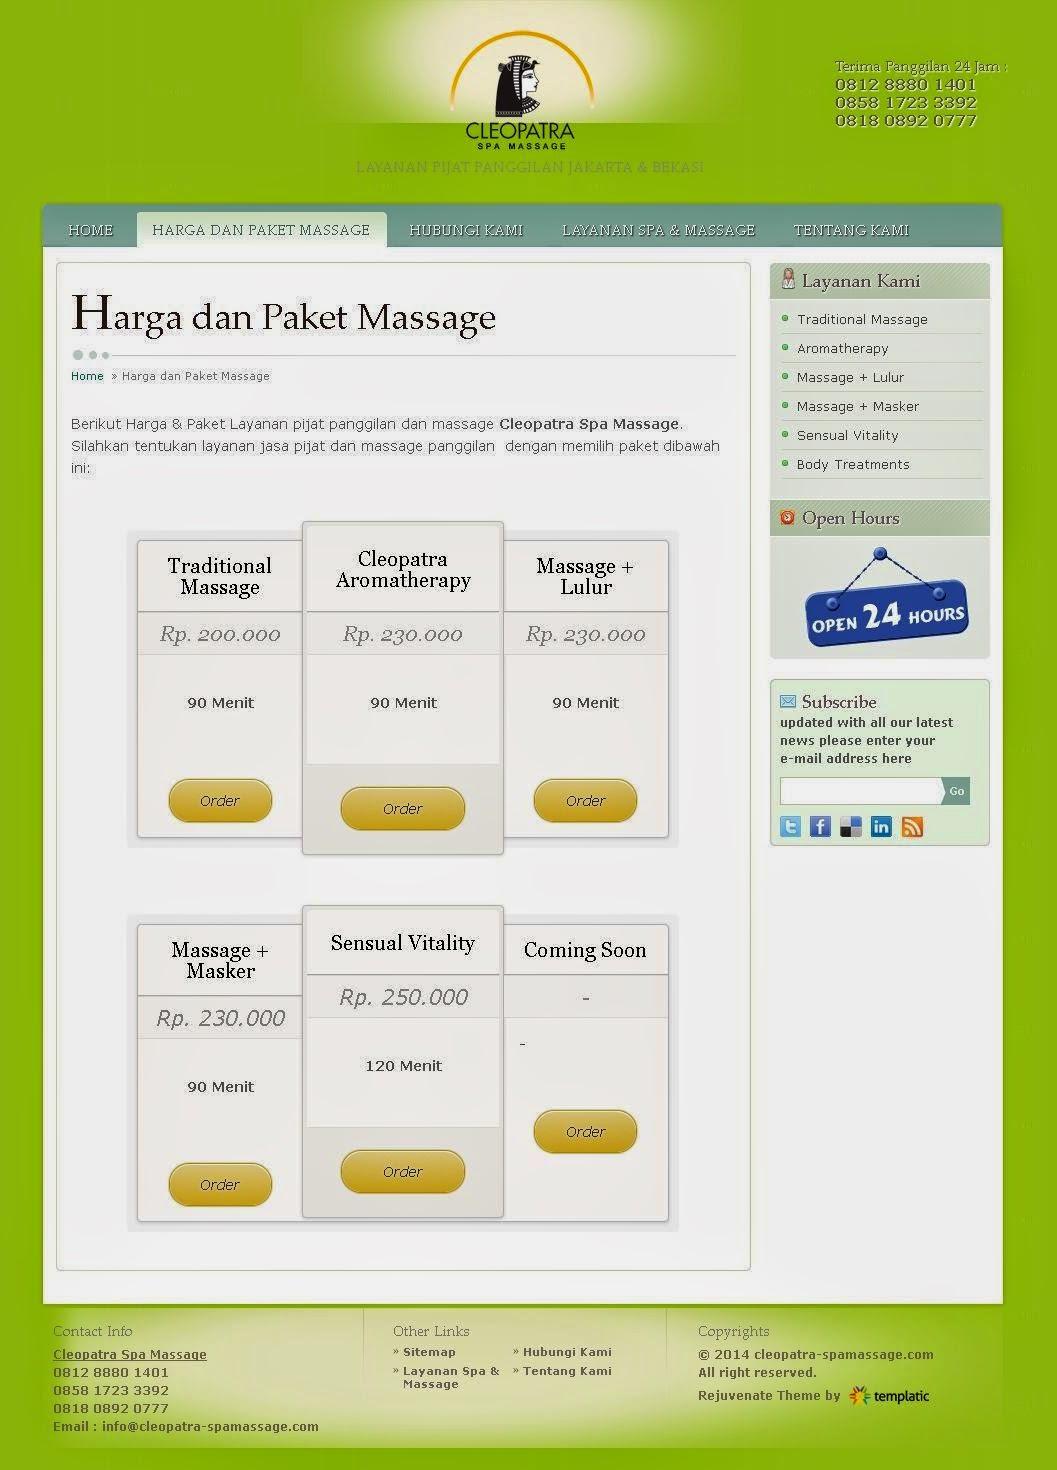 jasa pembuatan Website Jasa Pijat Panggilan Spamassage